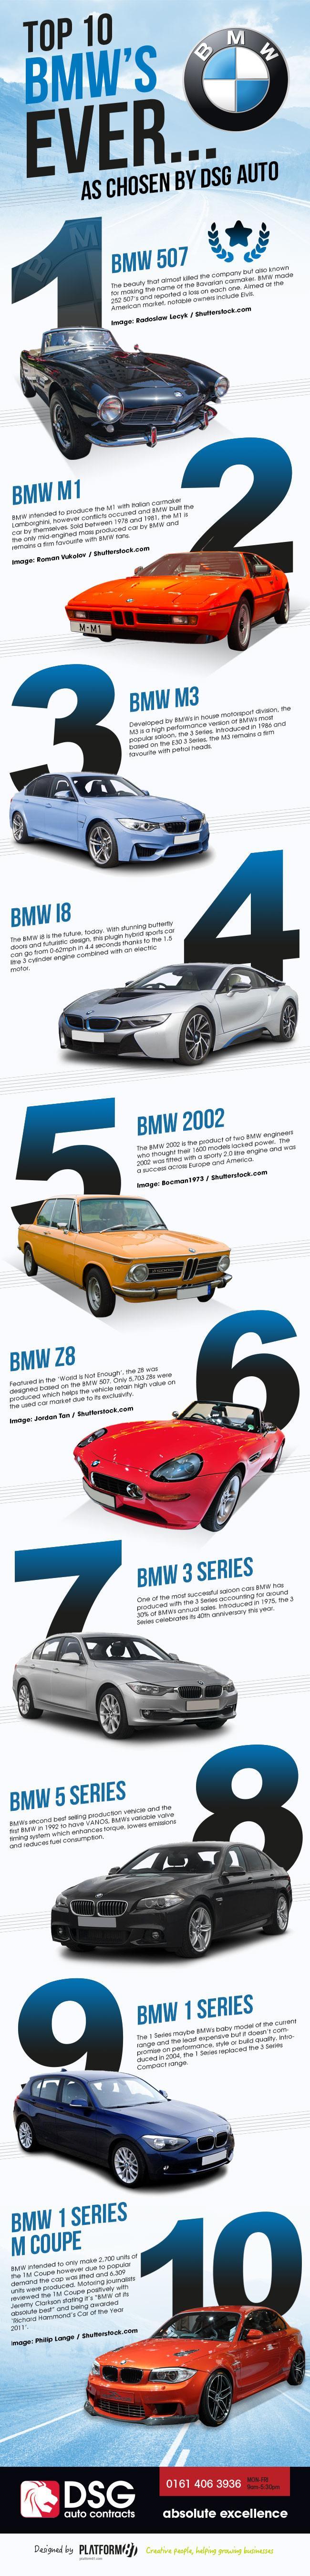 BMW Top 10 Cars